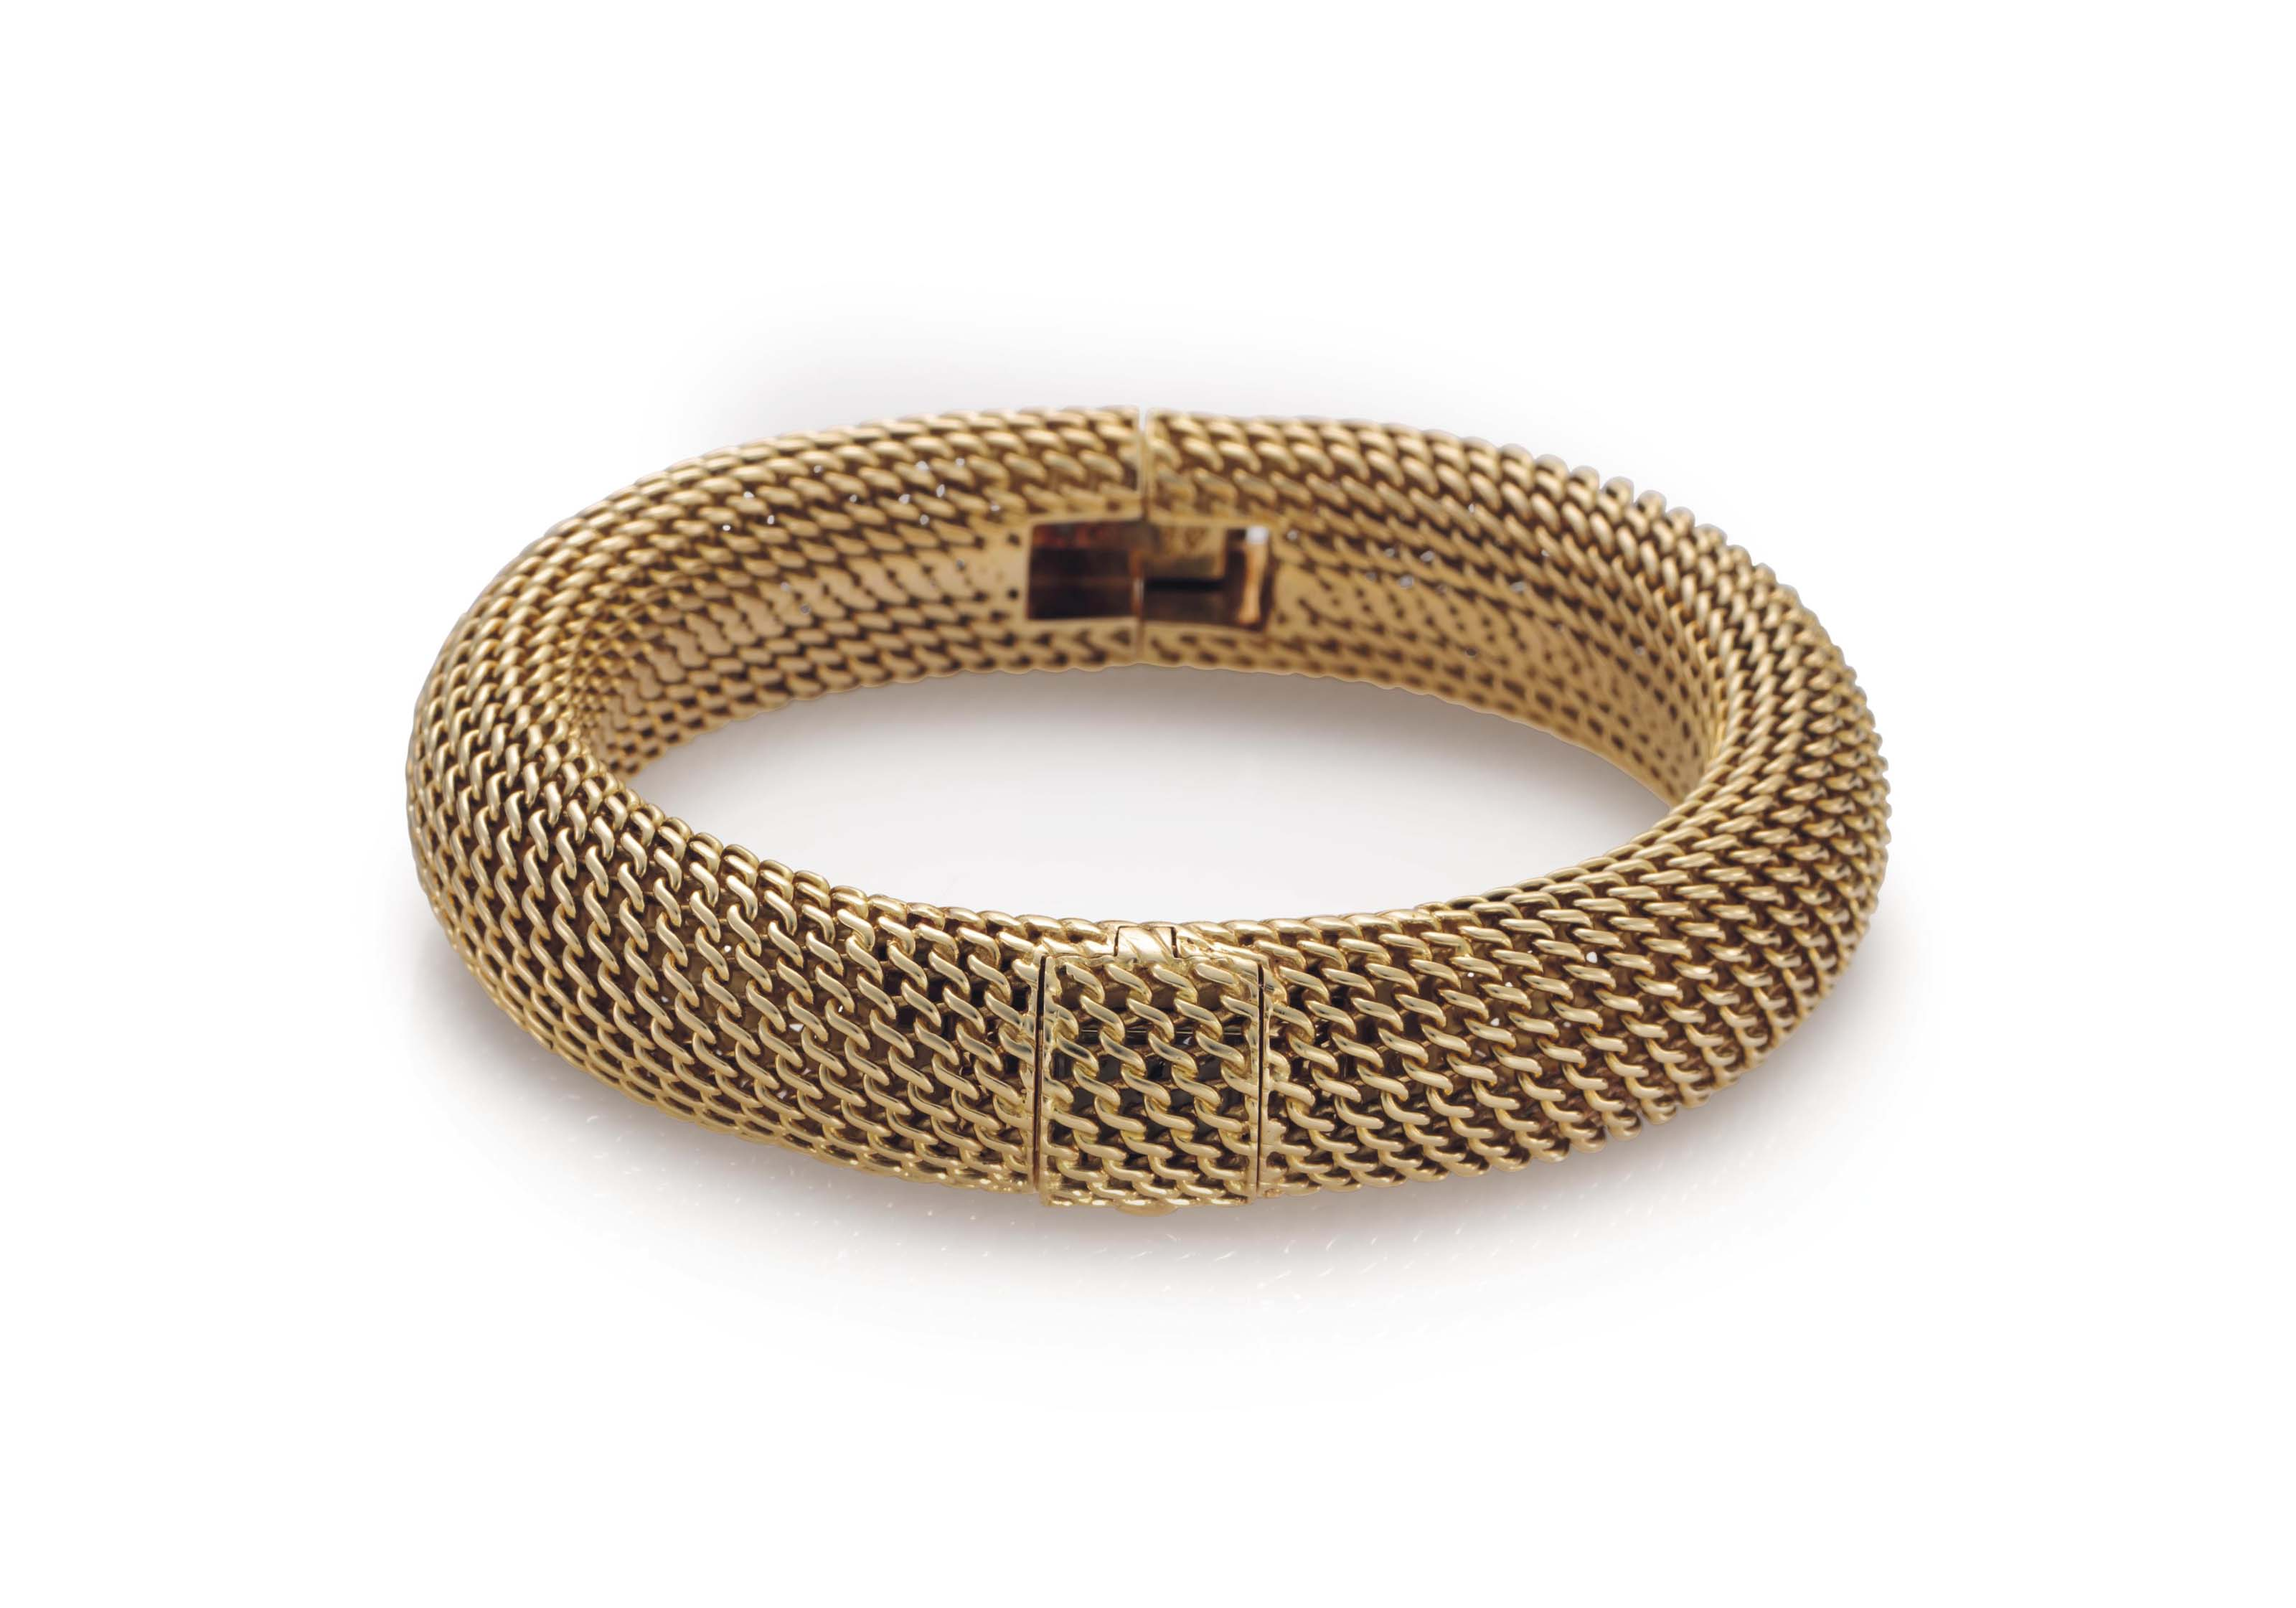 Audemars Piguet. A Lady's Fine 18k Gold Bracelet Watch with Concealed Dial